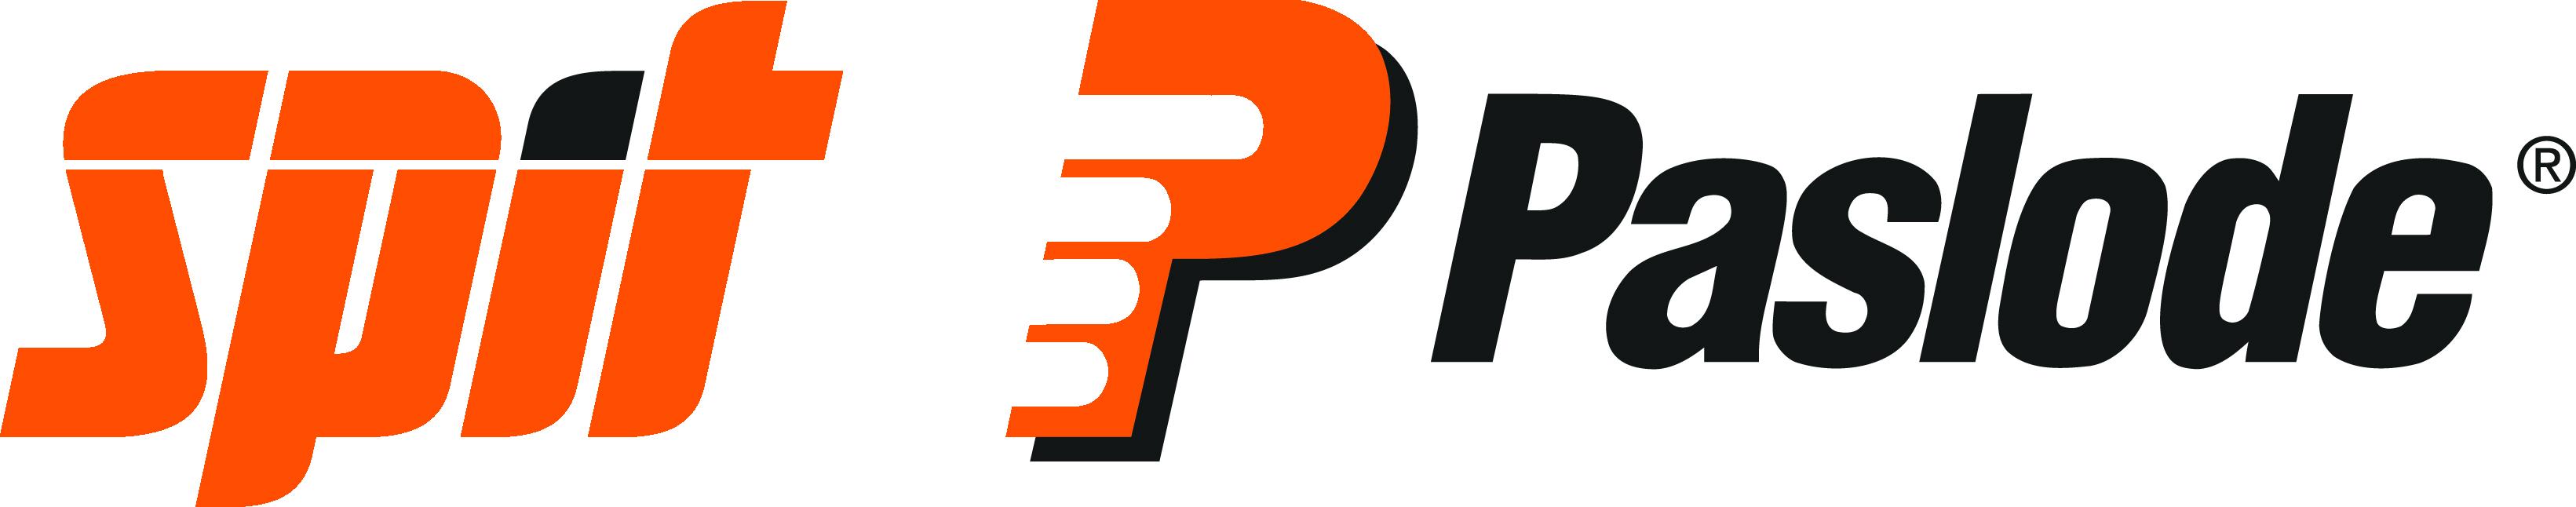 SPITPASLODE_RGB_Fond BLANC.JPG